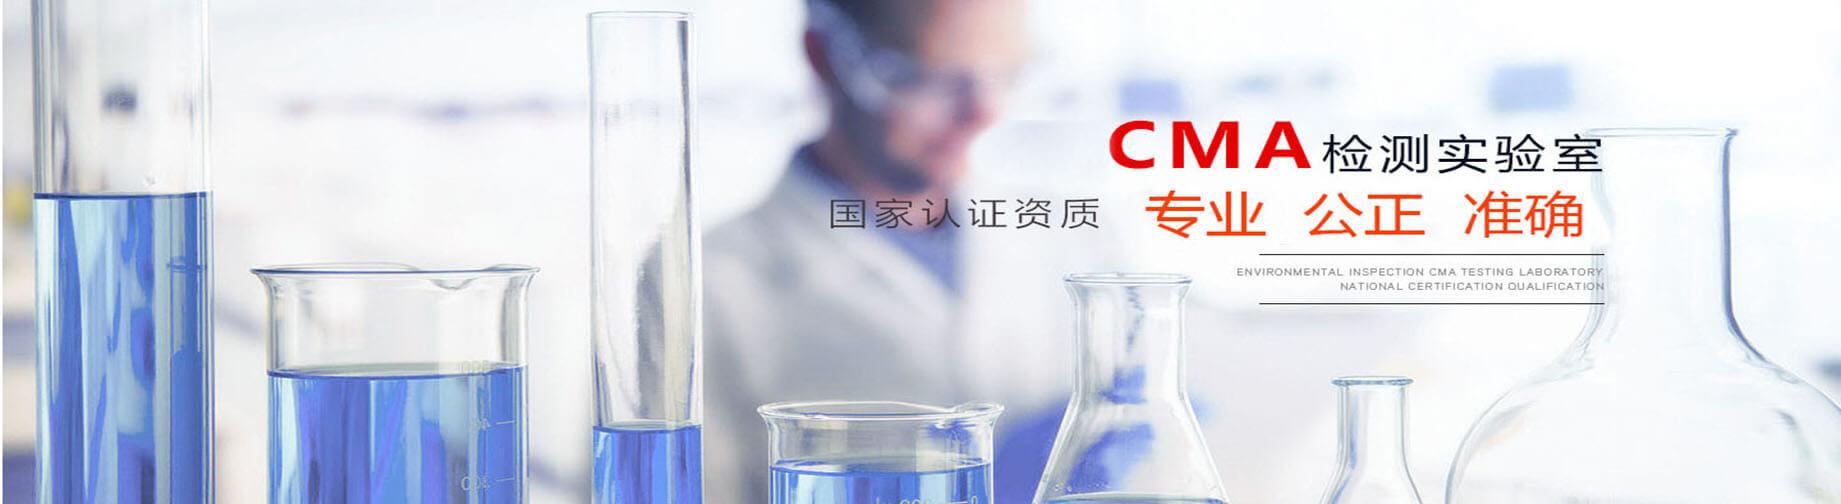 cma專業空氣測甲醛機構